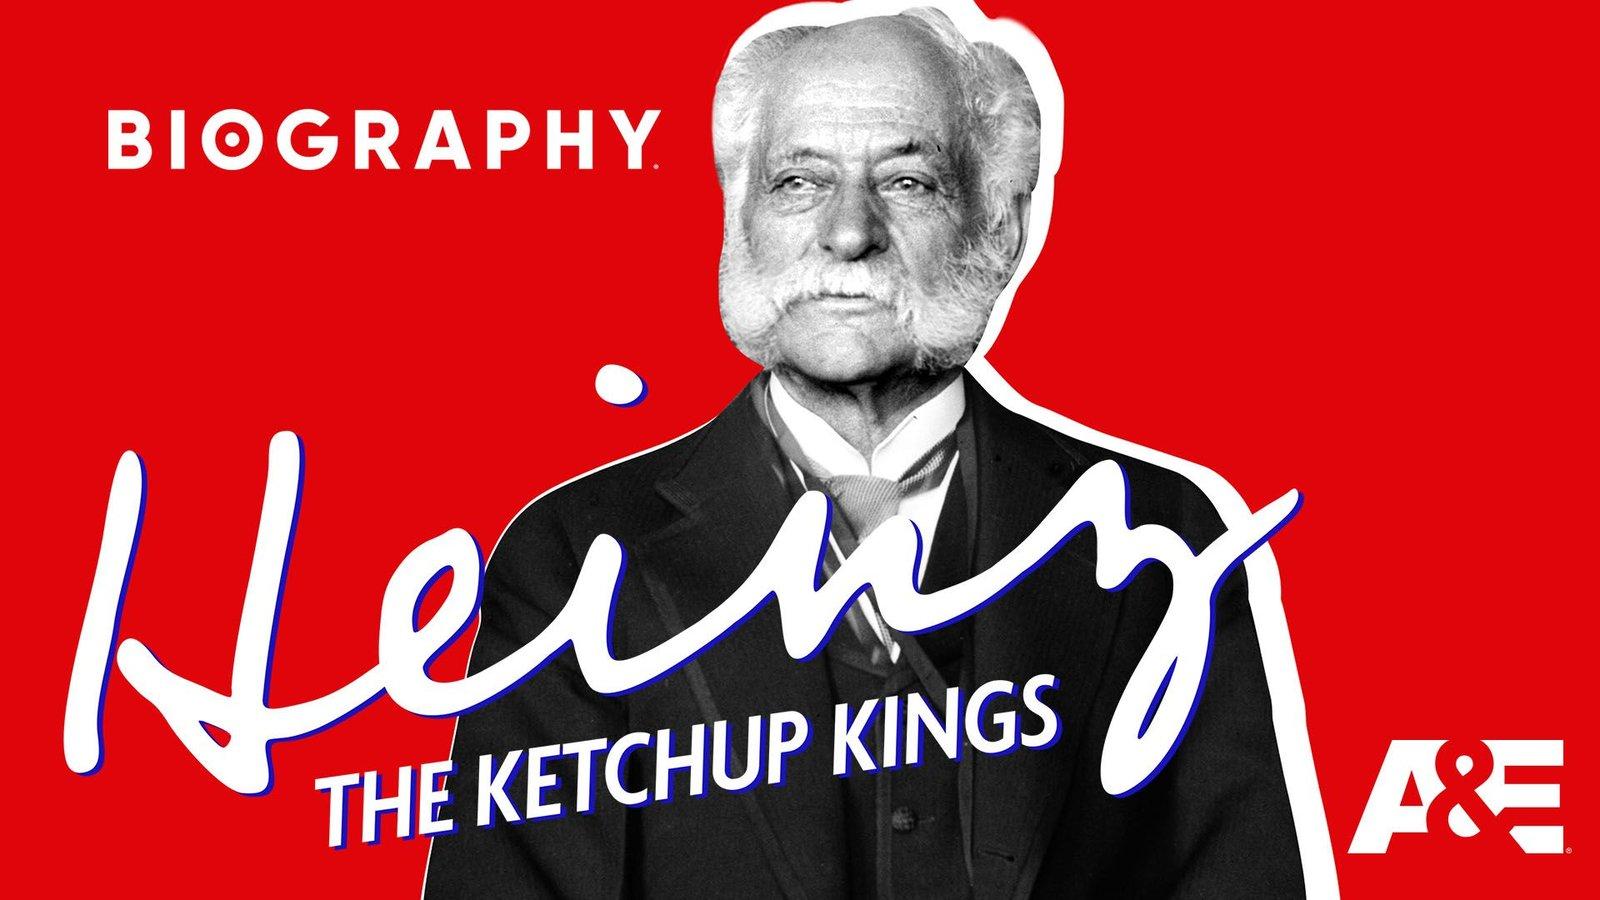 Heinz: The Ketchup Kings